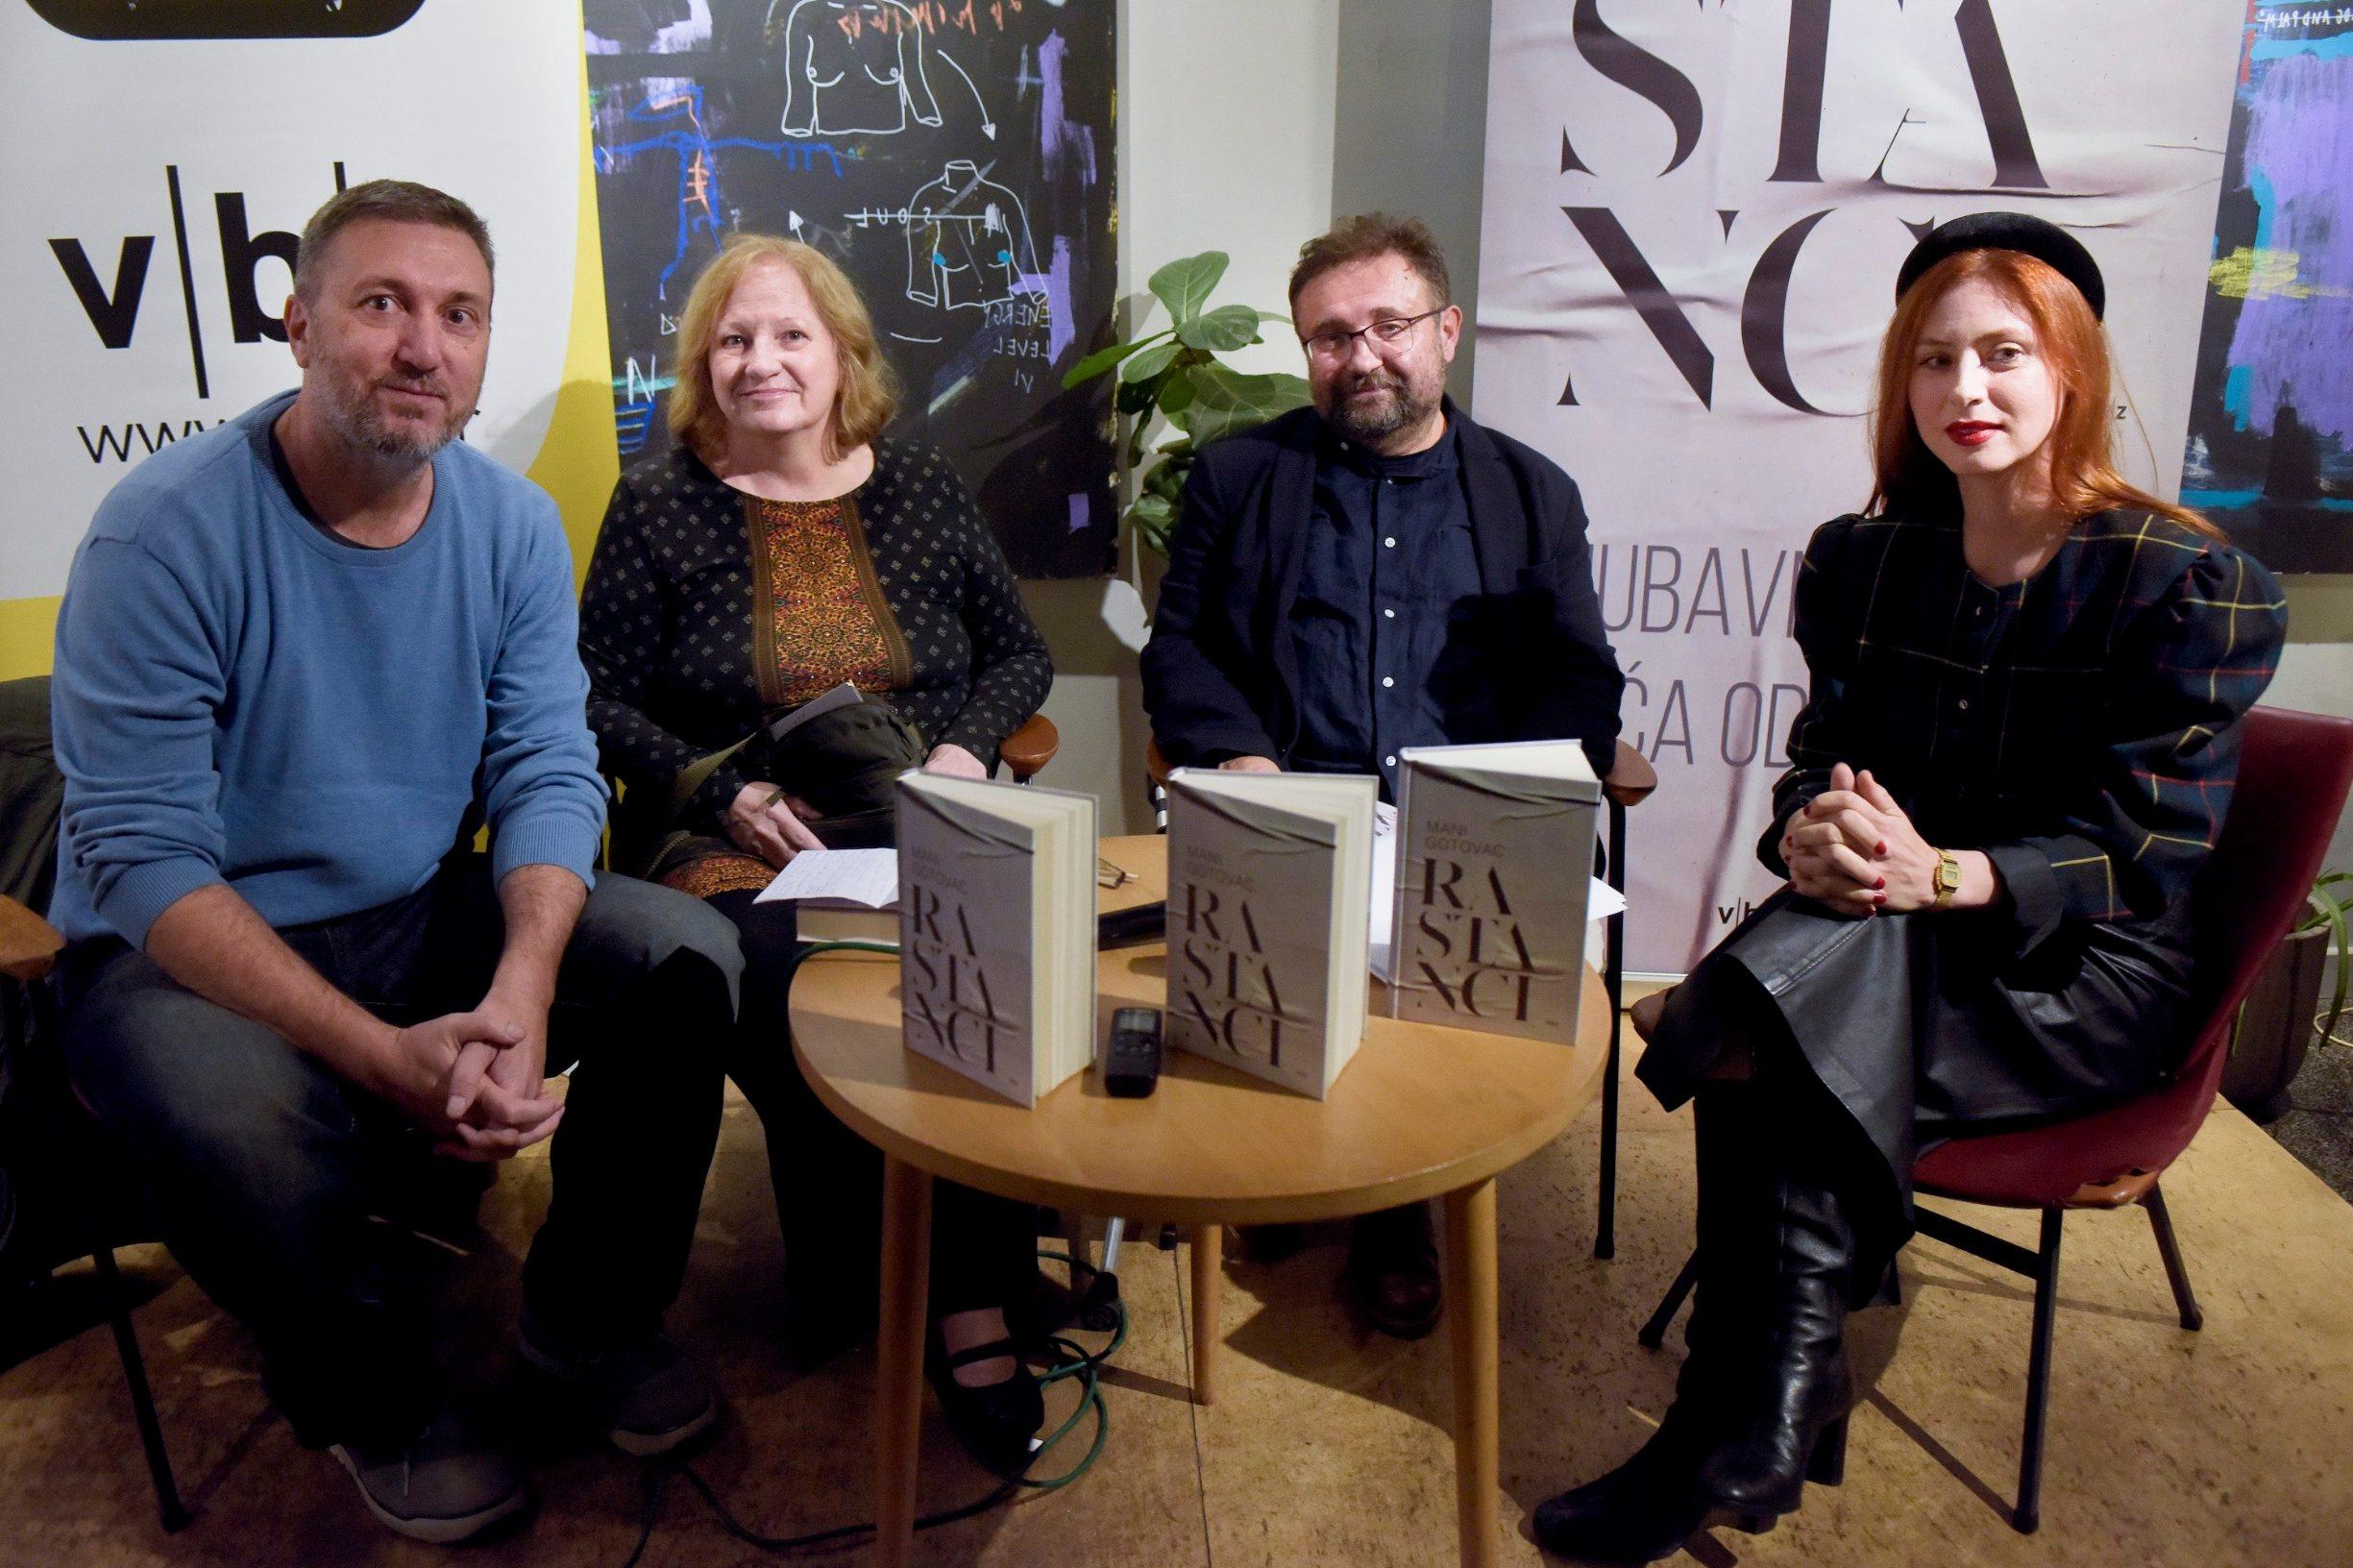 Drago Glamuzina, Andrea Zlatar, Zoran Ferić i Judita Franković